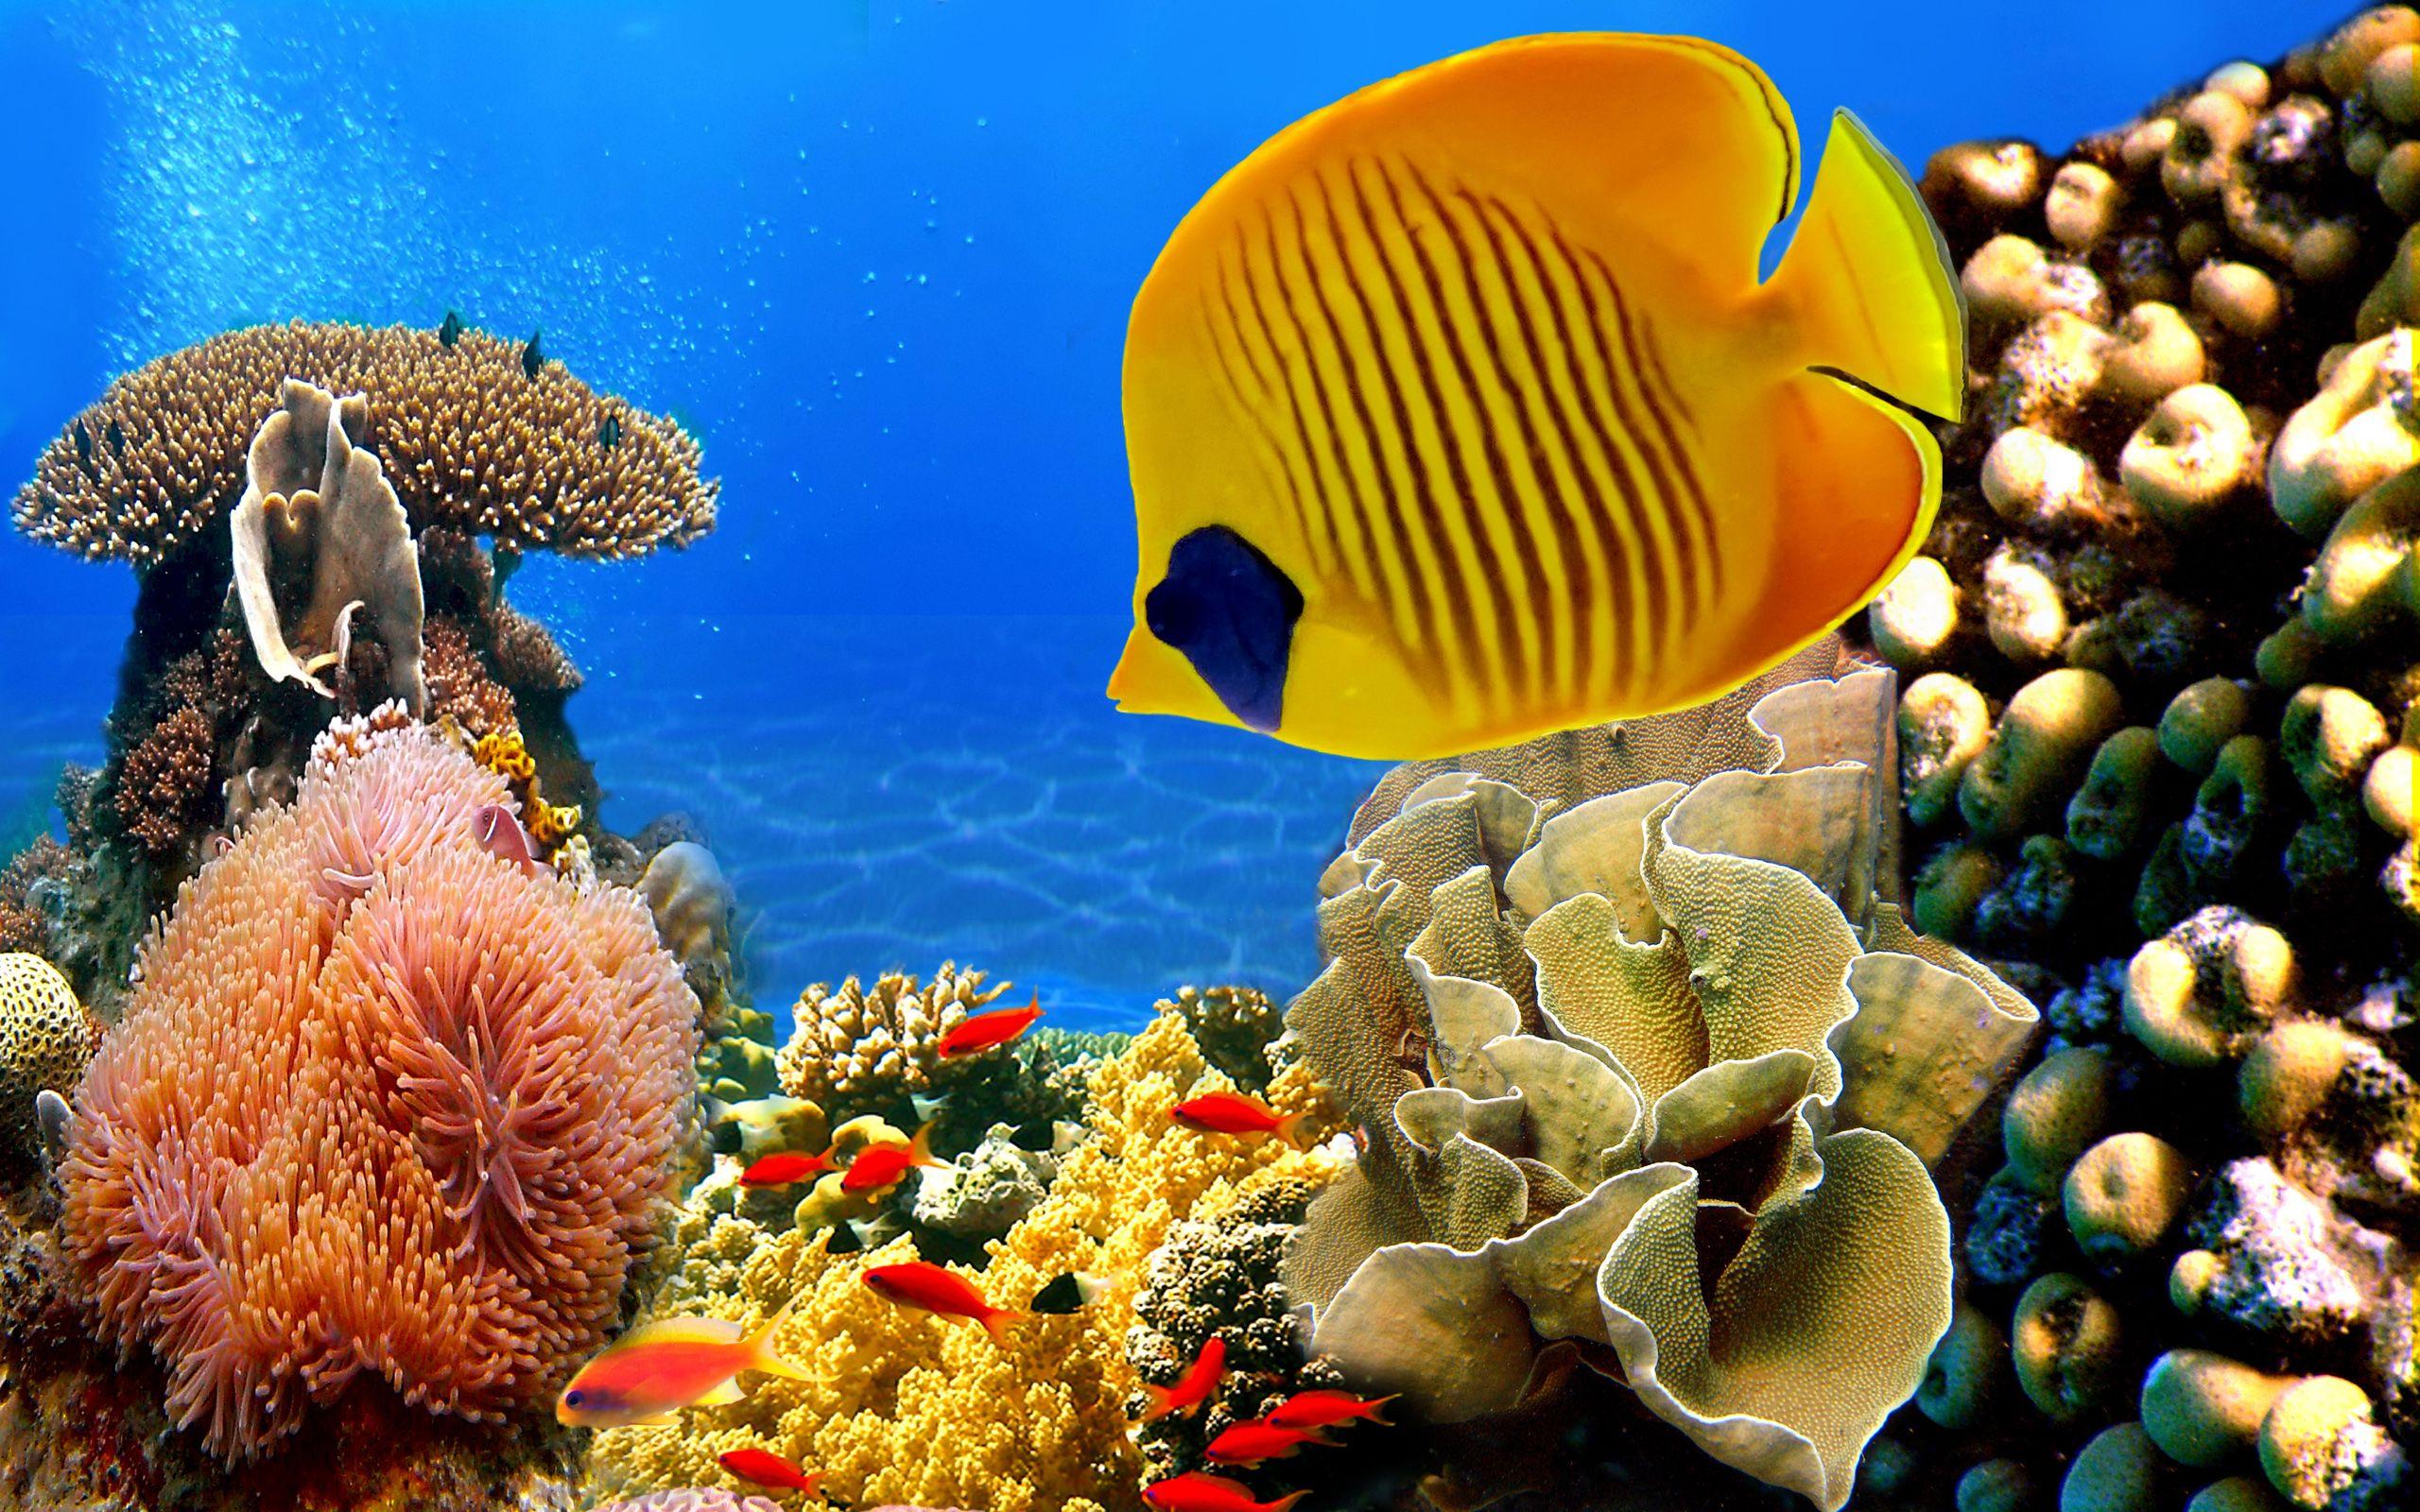 Tropical Fish Wallpapers For Desktop Free Desk Wallpapers Underwater Fish Tropical Fish Fish Wallpaper